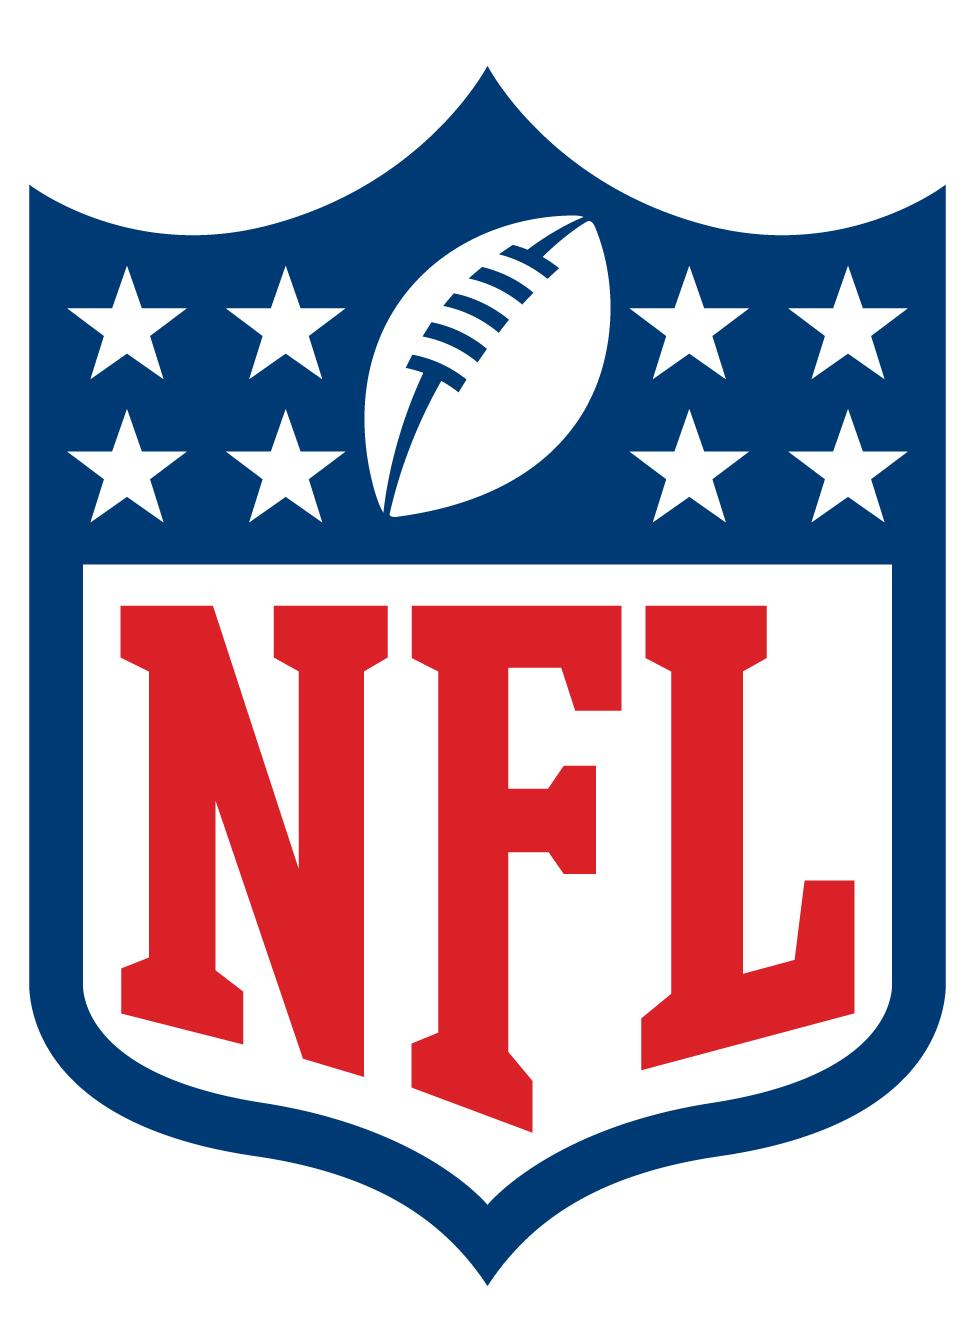 NFL_Shield_mark_rgb.jpg